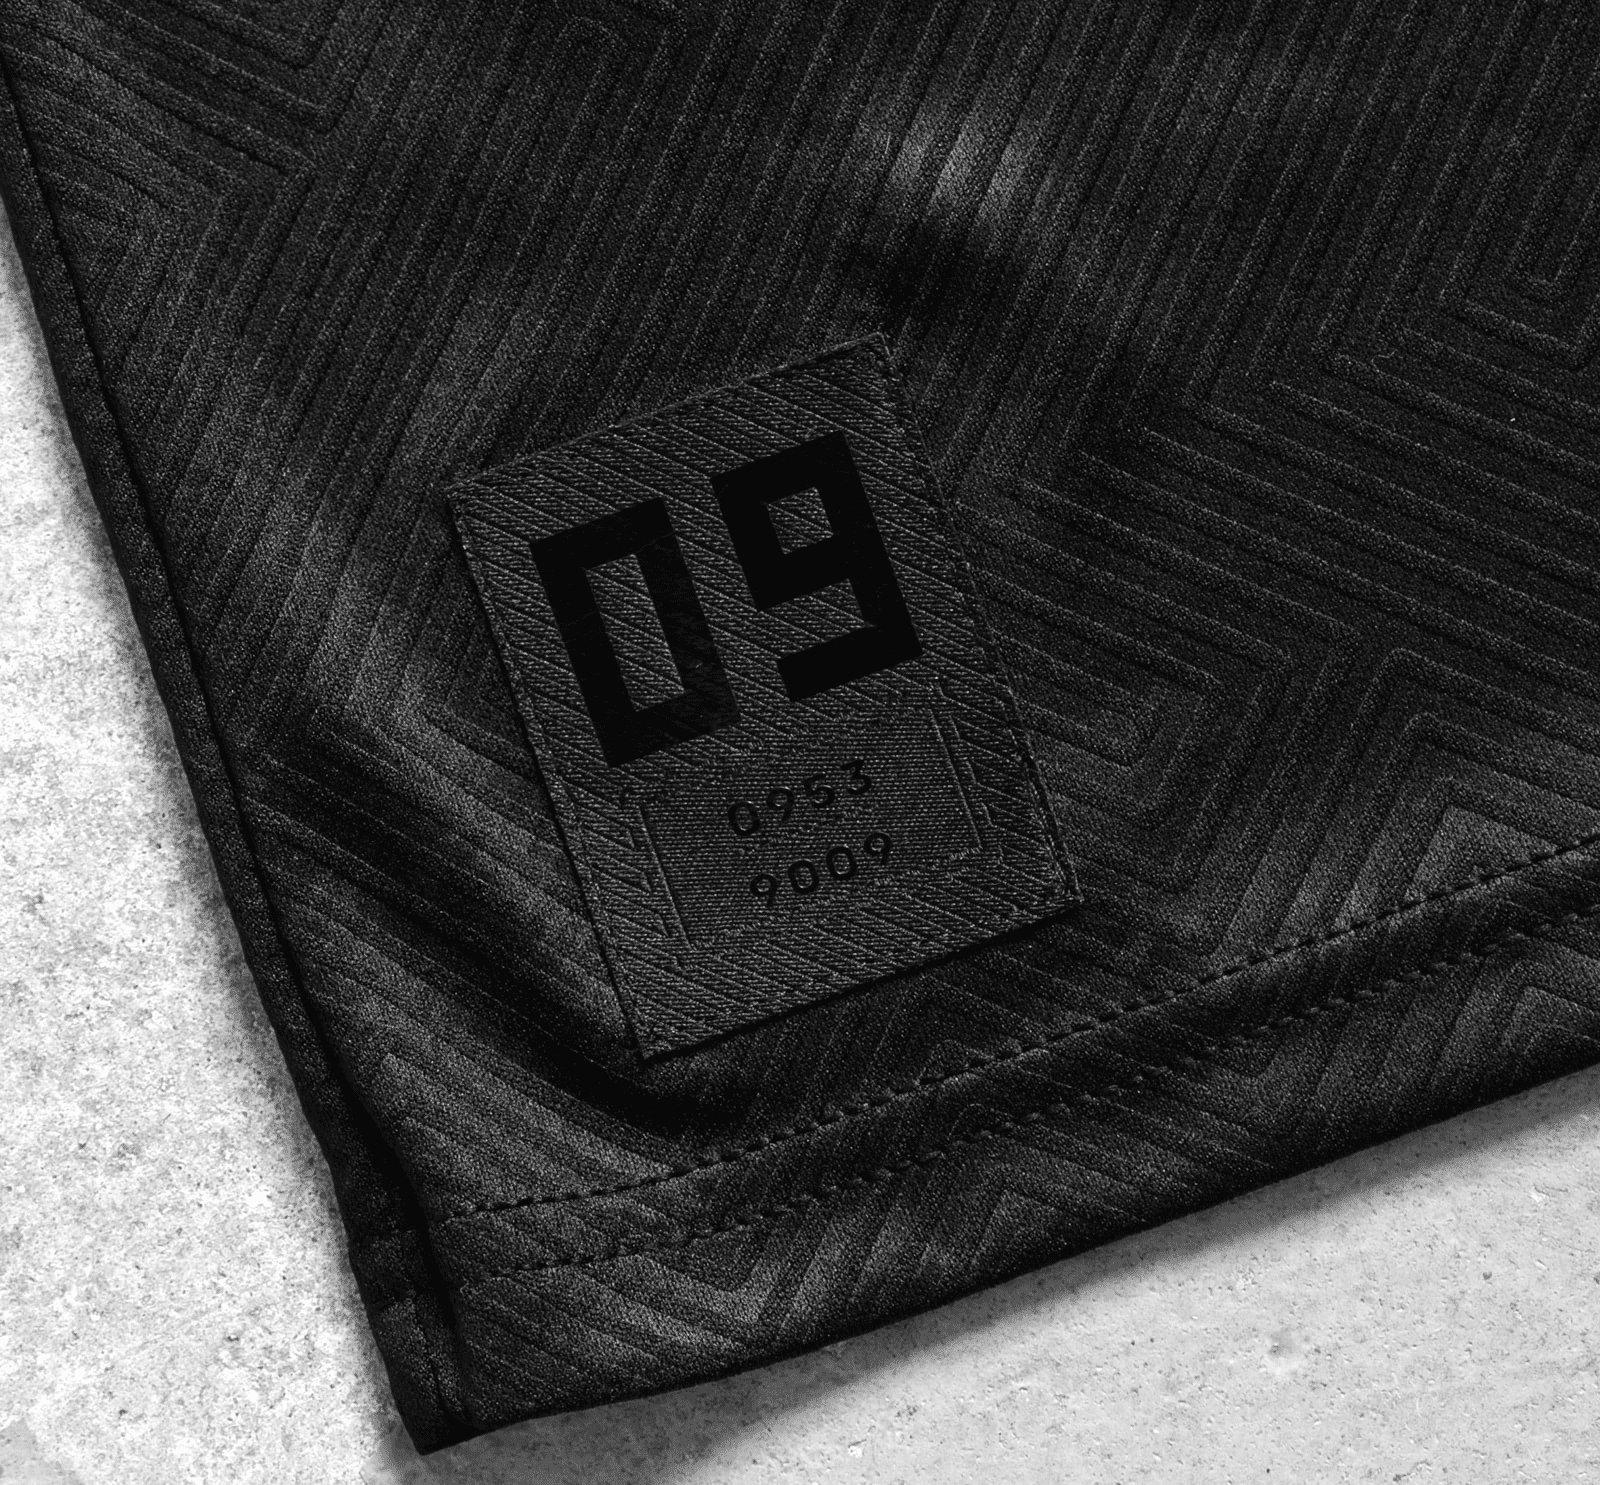 Borussia Dortmund 2019 Puma 110th Anniversary Kit 19 20 Kits Football Shirt Blog